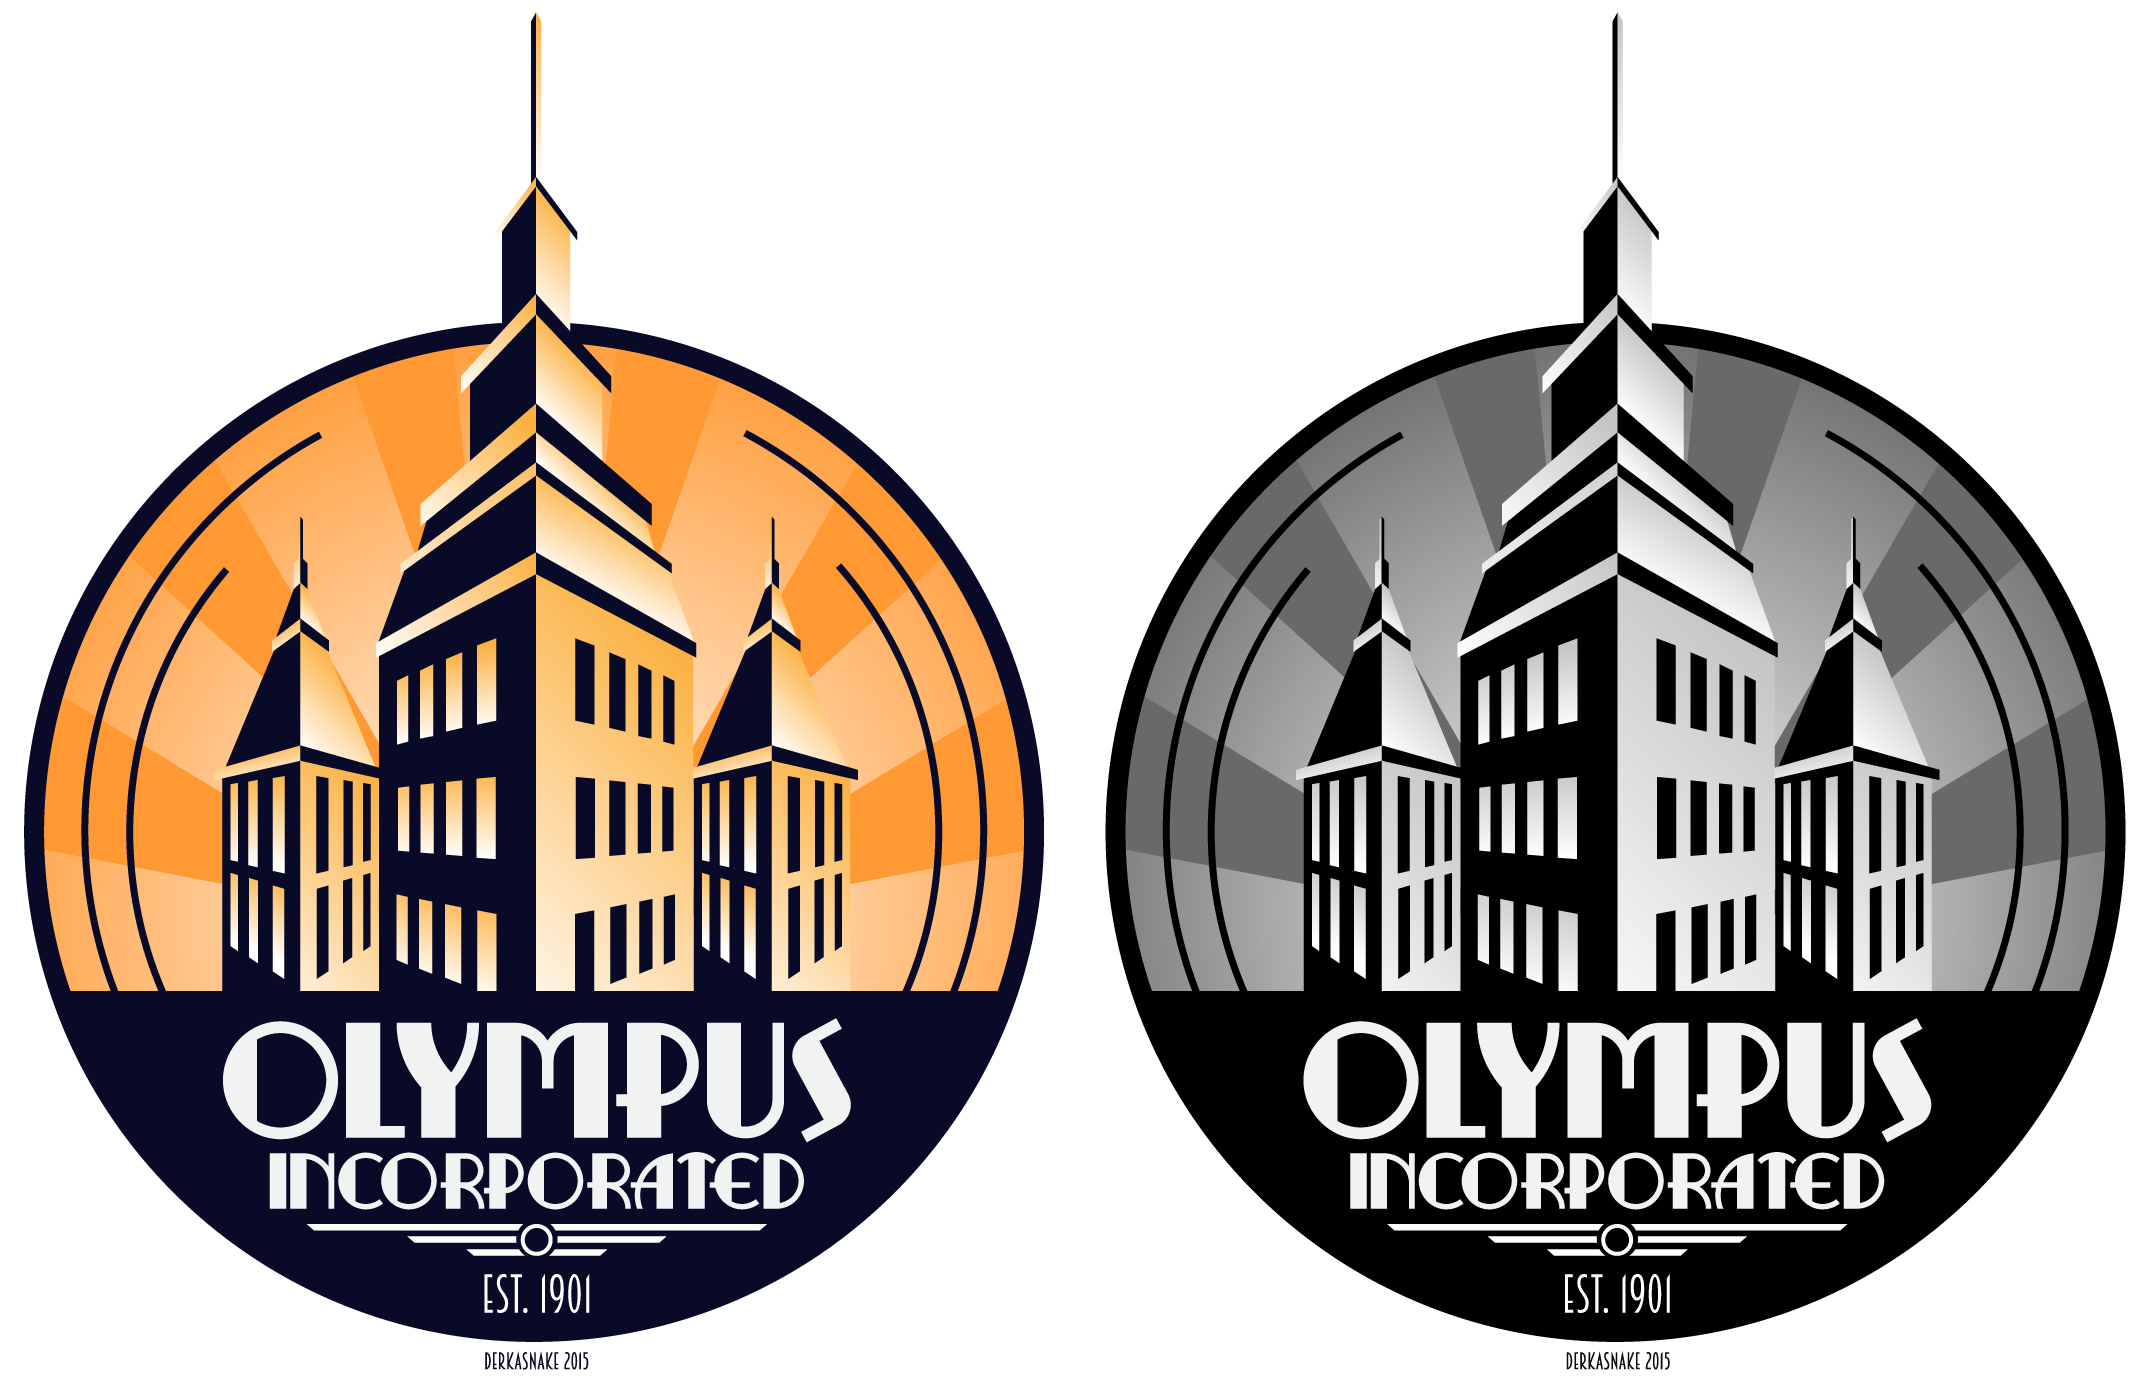 olympus incorporated art deco logo by derkasnake on deviantart. Black Bedroom Furniture Sets. Home Design Ideas